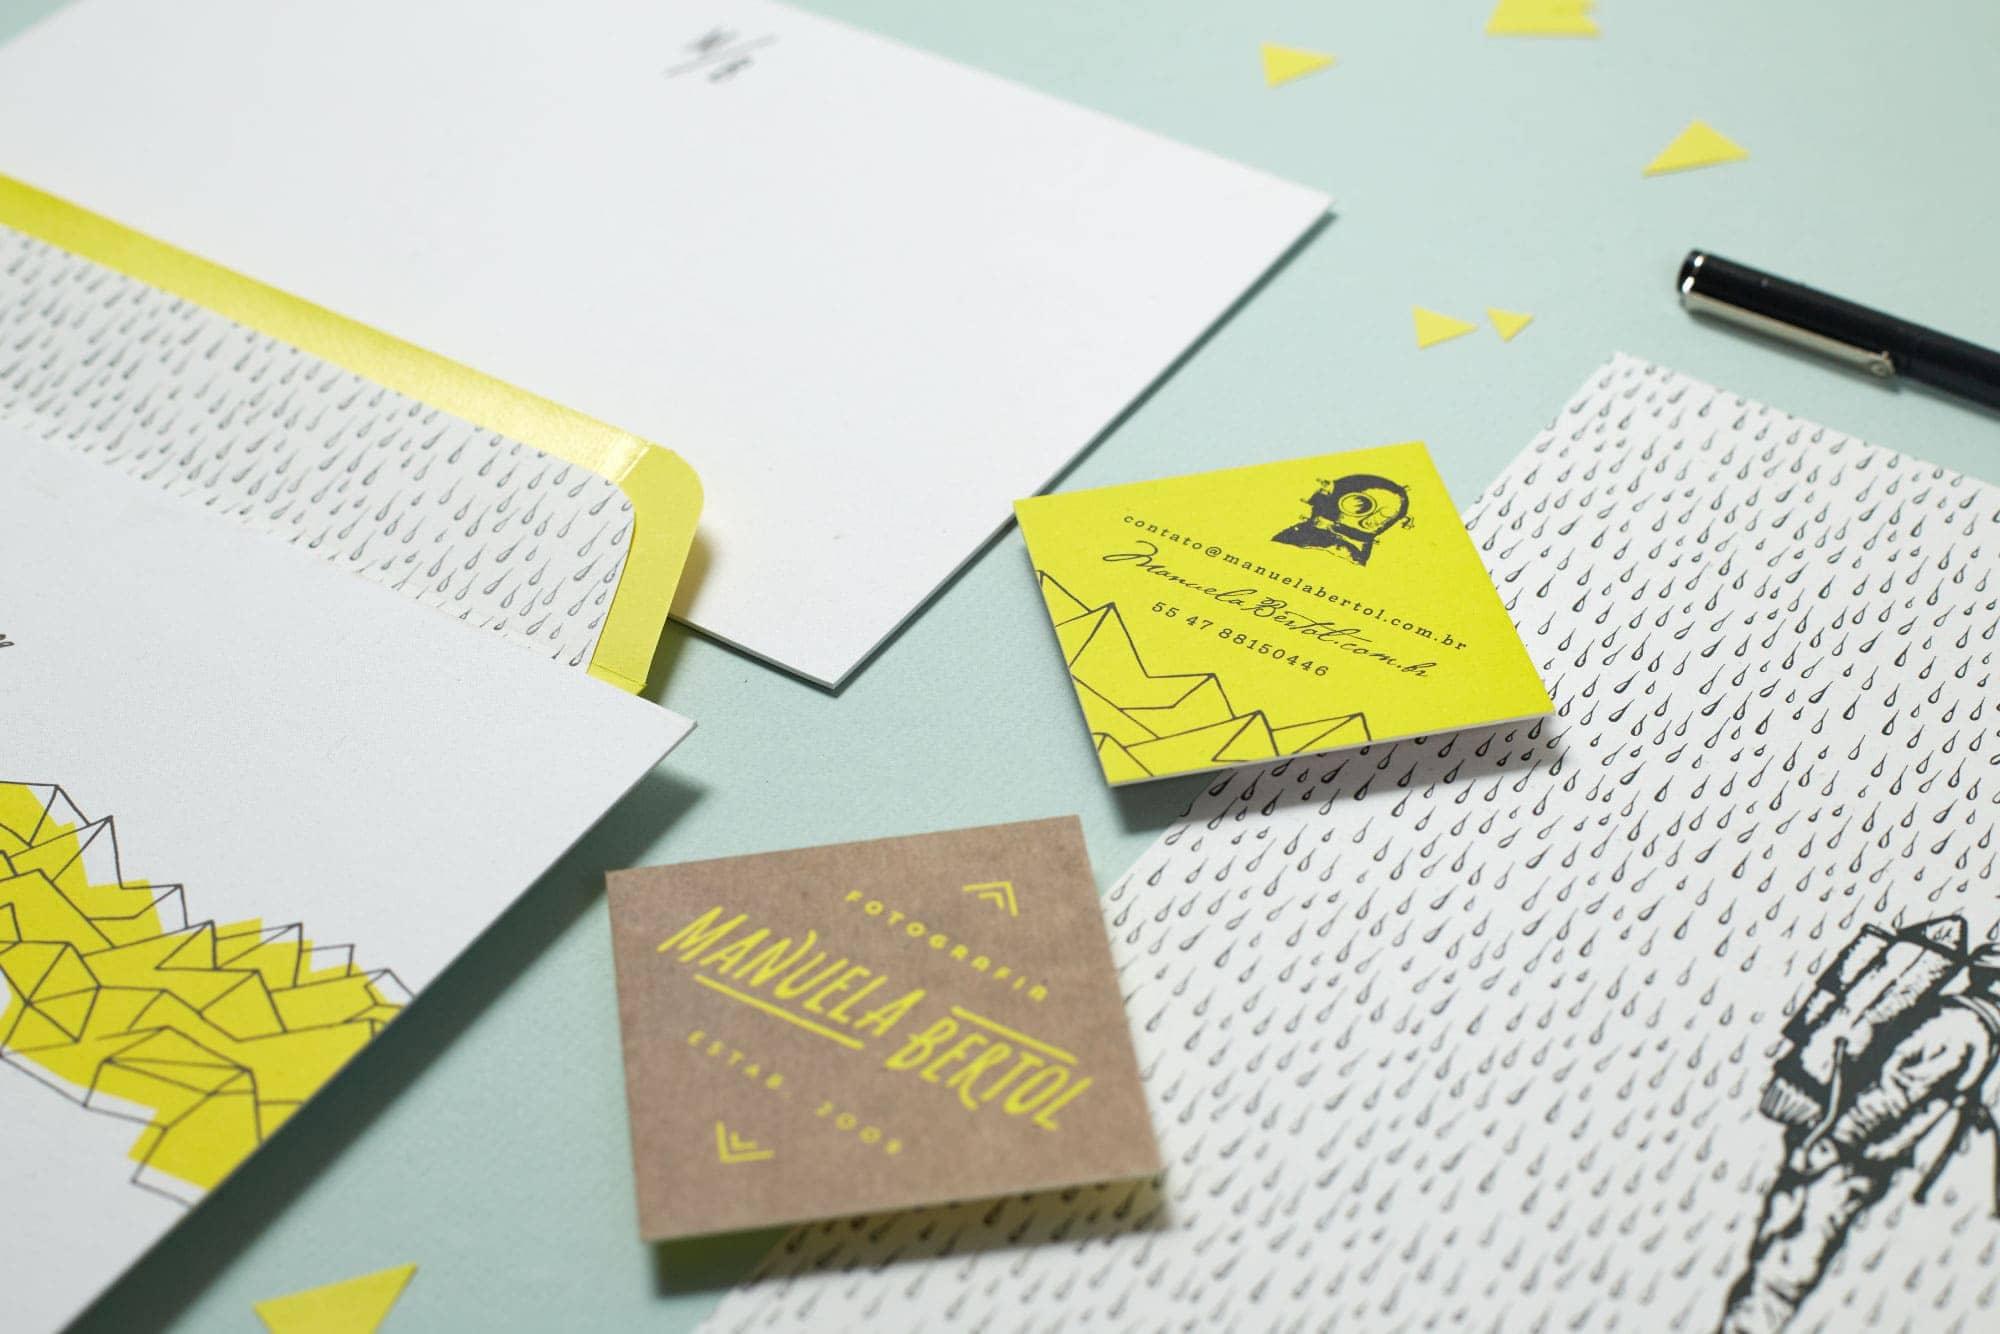 Brand-Identity-Design-Manuela-Bertol